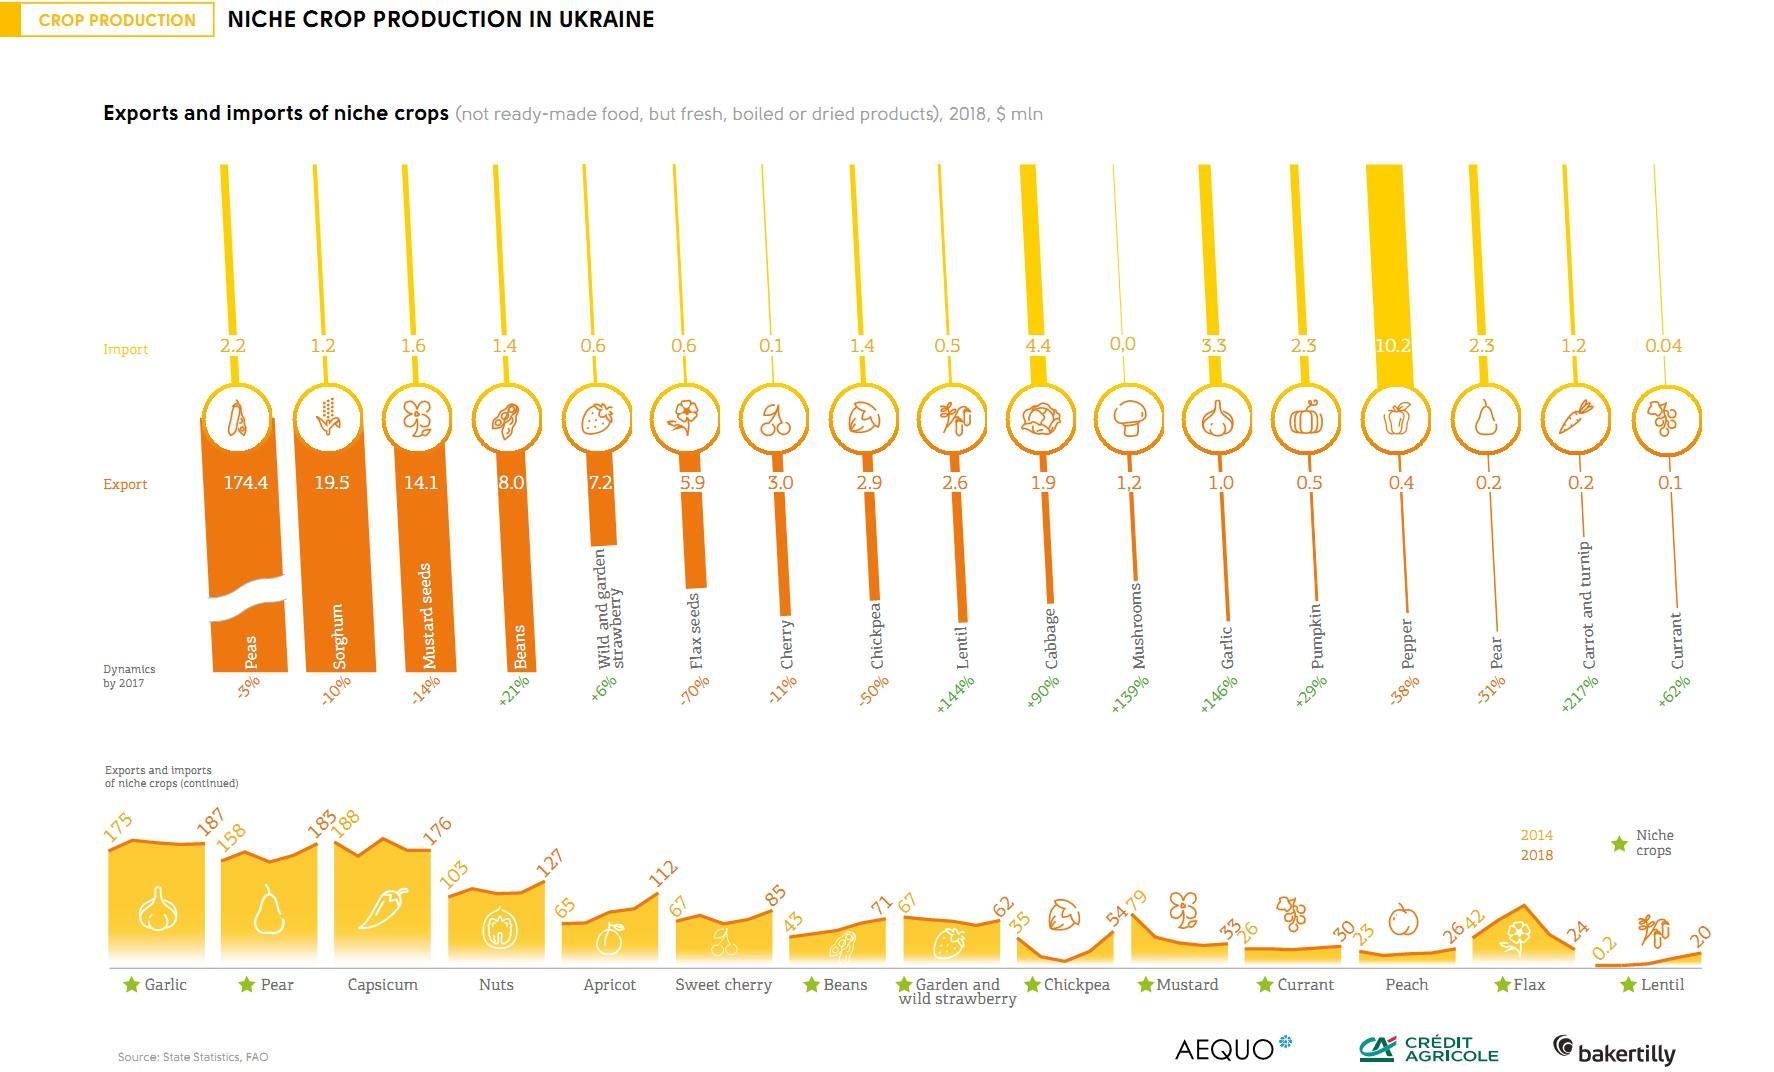 Niche crops production in Ukraine (click for full resolution)